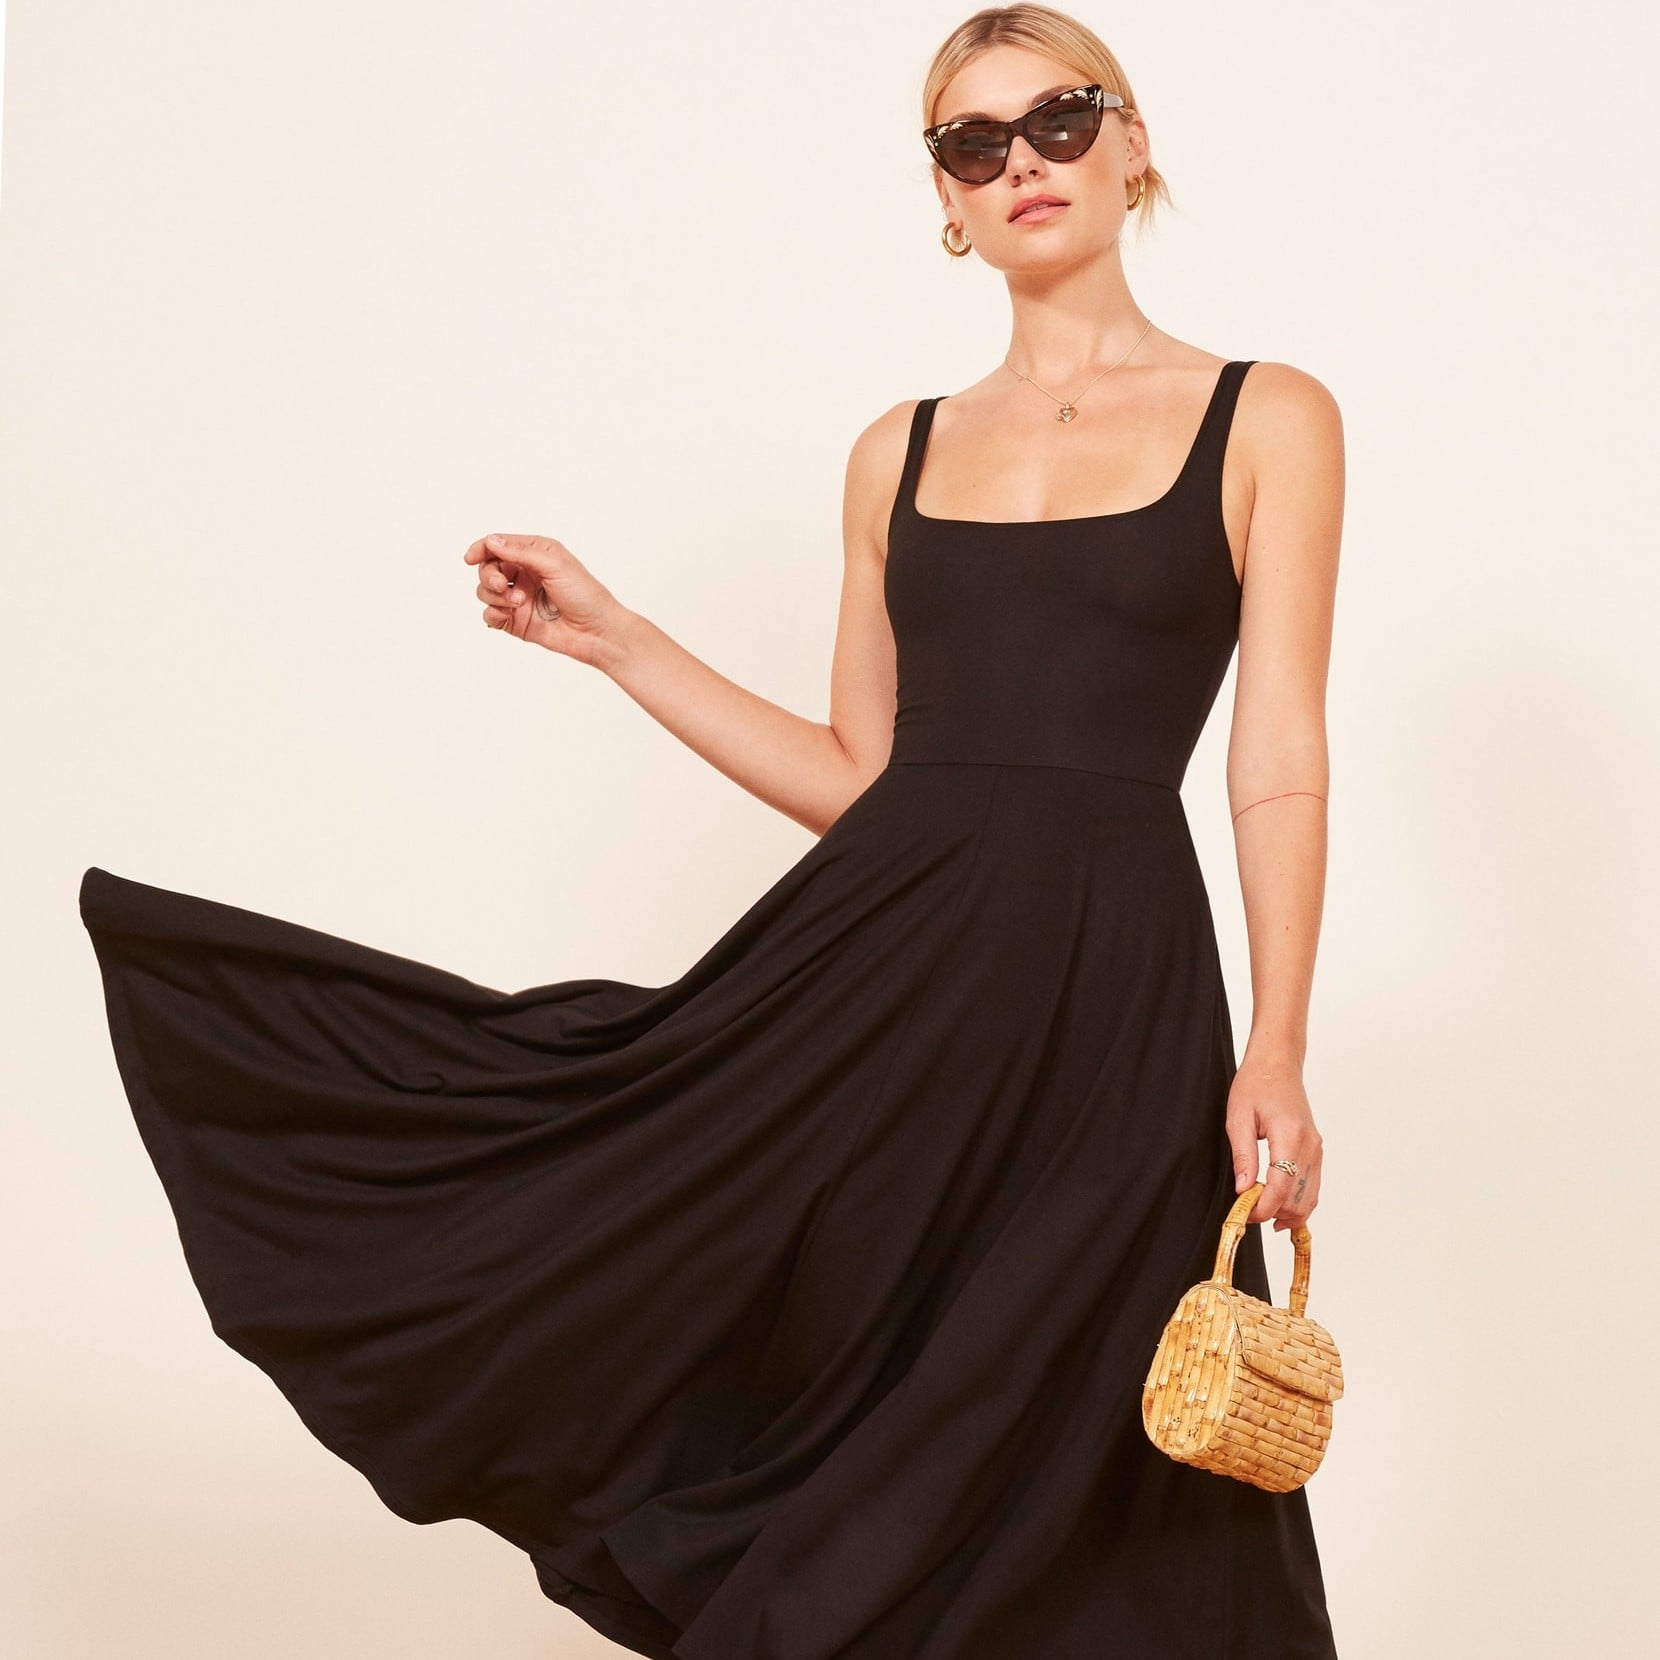 Bestselling Dress From Nordstrom | POPSUGAR Fashion